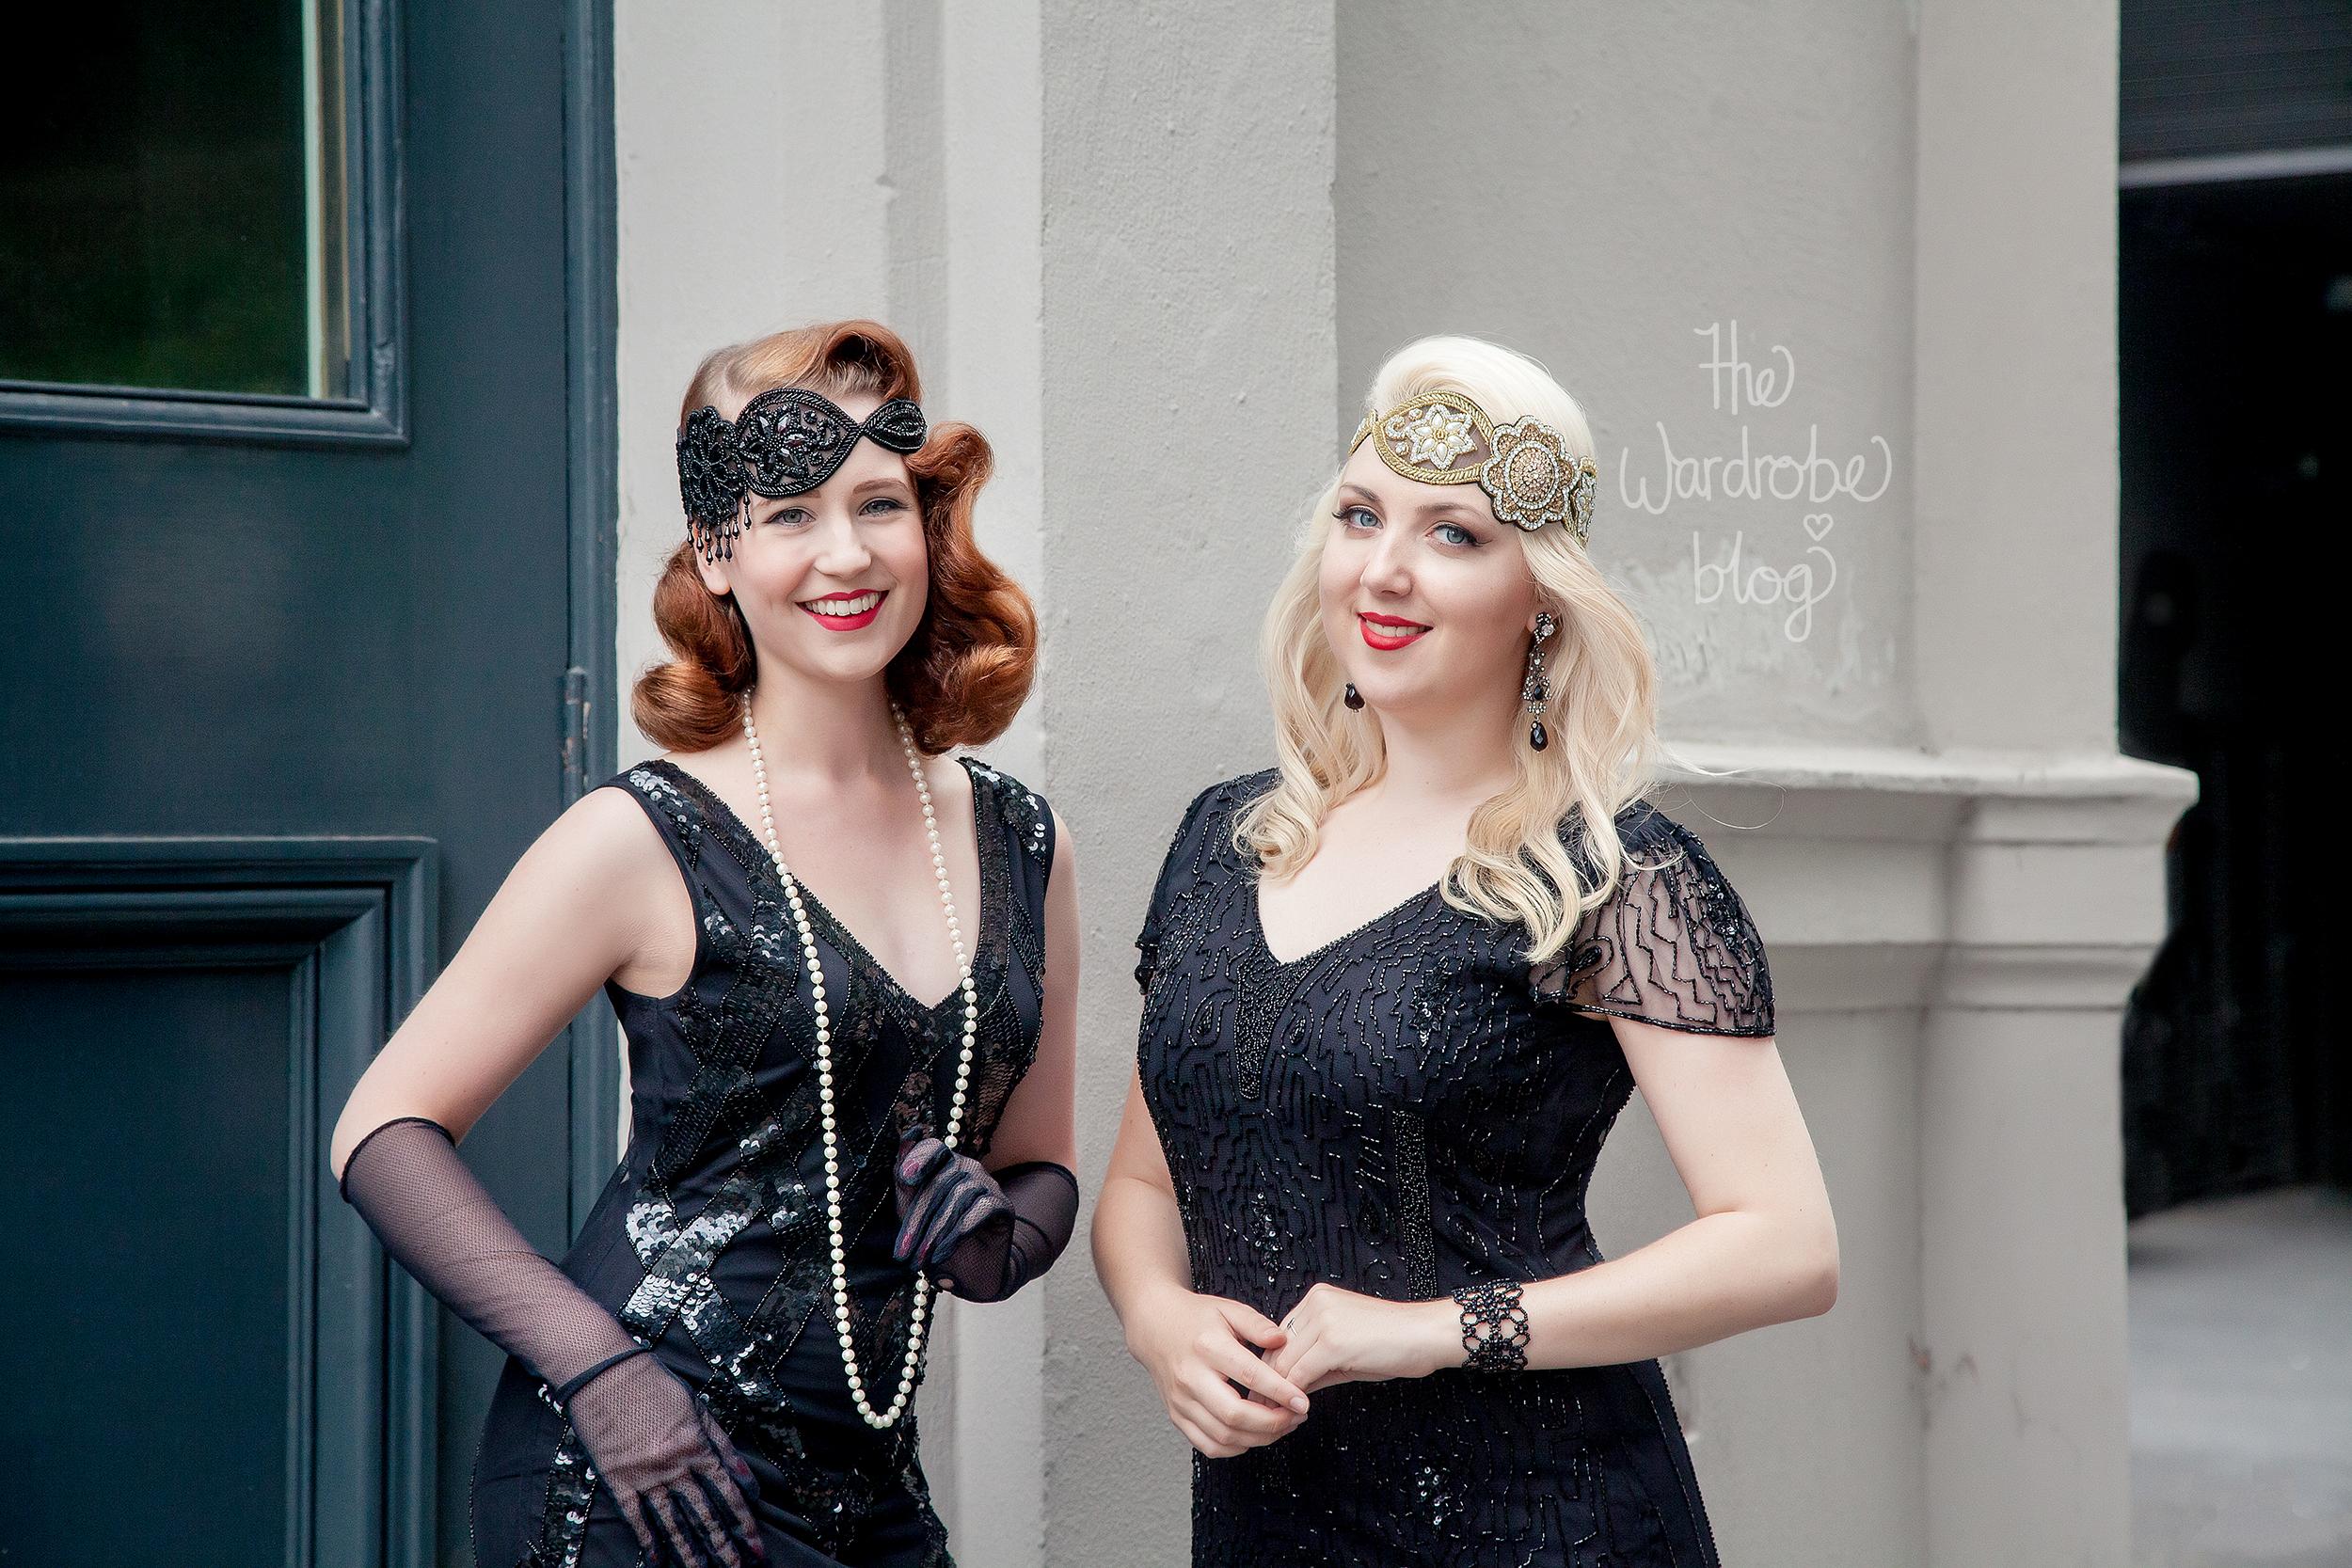 I wear: Downton Abbey Vintage Inspired Flapper Dress in Black, with the Amelia Vintage headband. Earrings + Bracelet from Lovisa + Shoes from Mi Piaci.// Miss HH wears:Glitz Vintage Inspired Fringe Dress in Black, and the Julia Vintage headband.